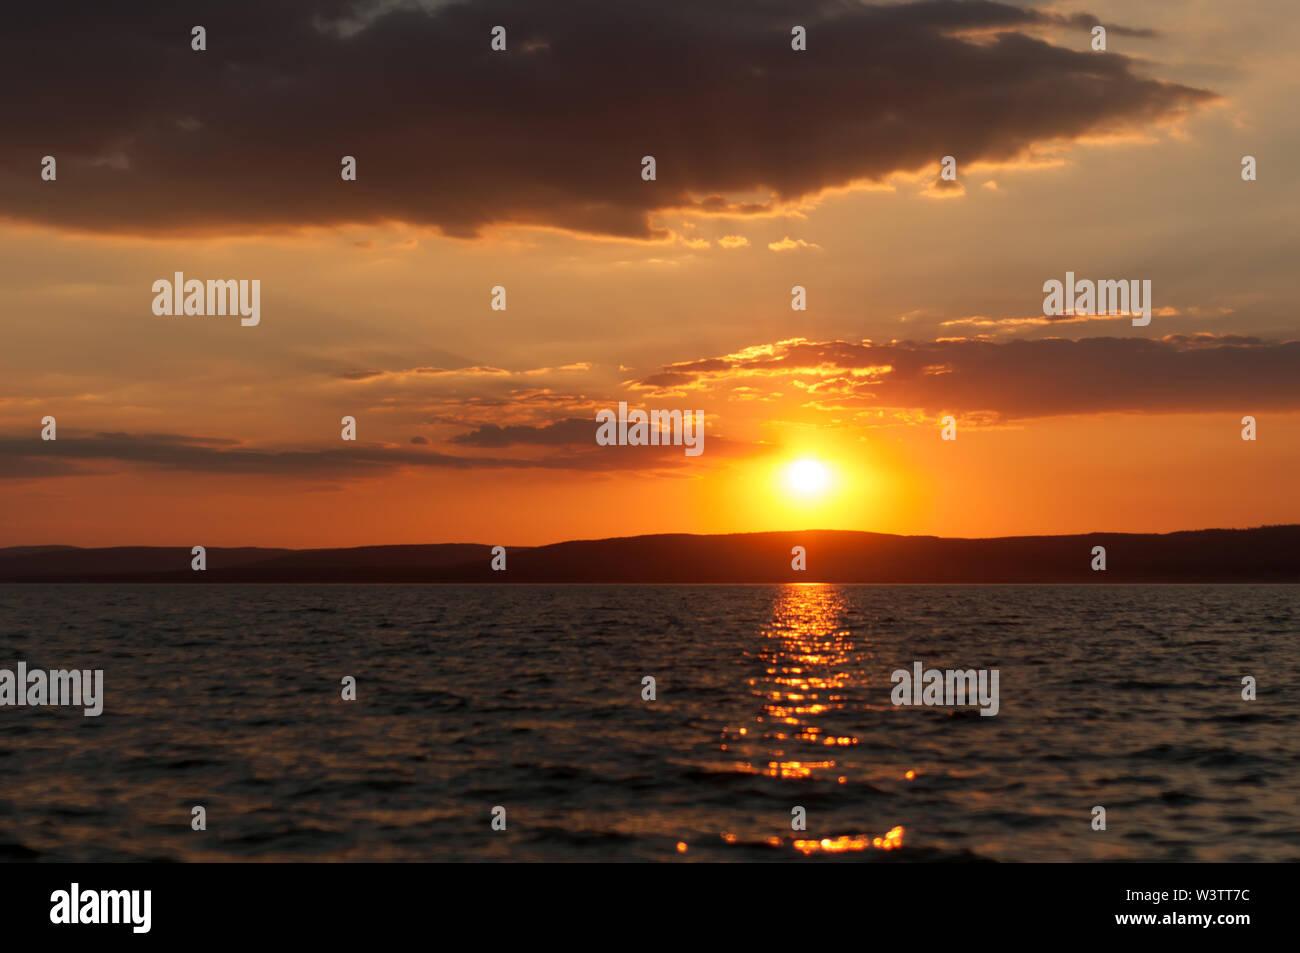 Beautiful sunset over the Balaton Lake in Hungary, Europe on a summer day. - Stock Image